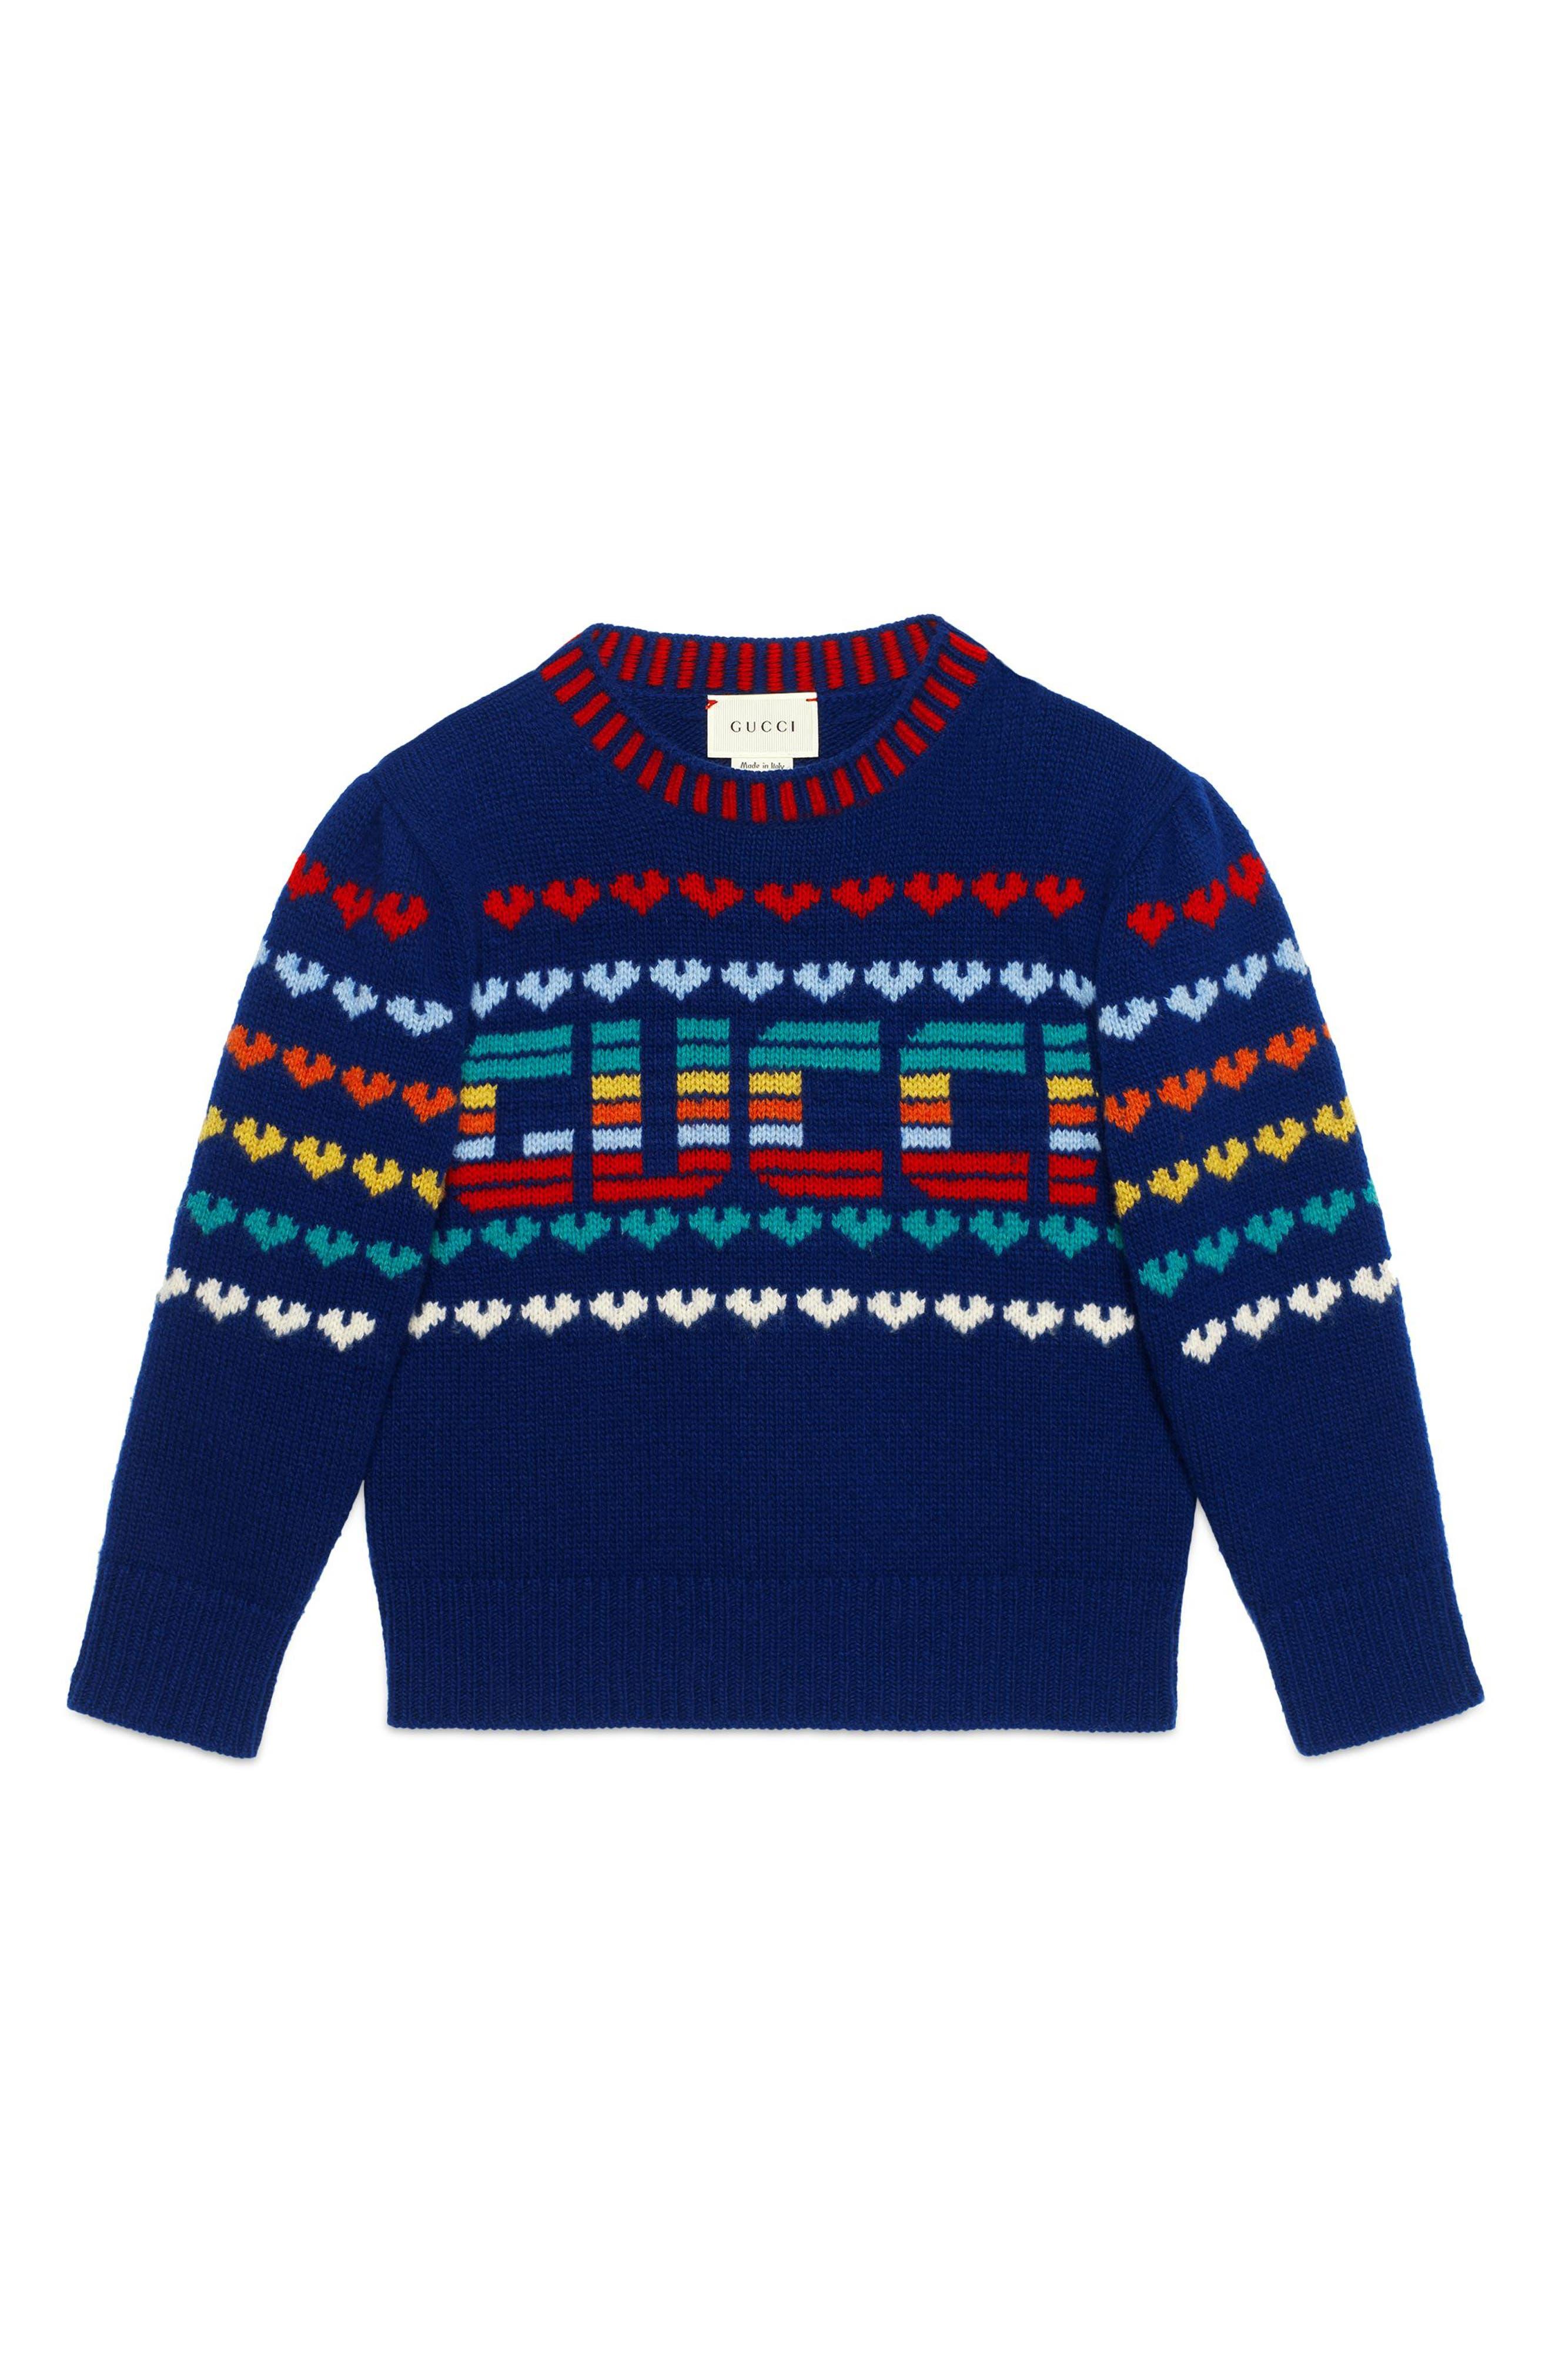 Gucci Intarsia Sweater (Little Girls & Big Girls)